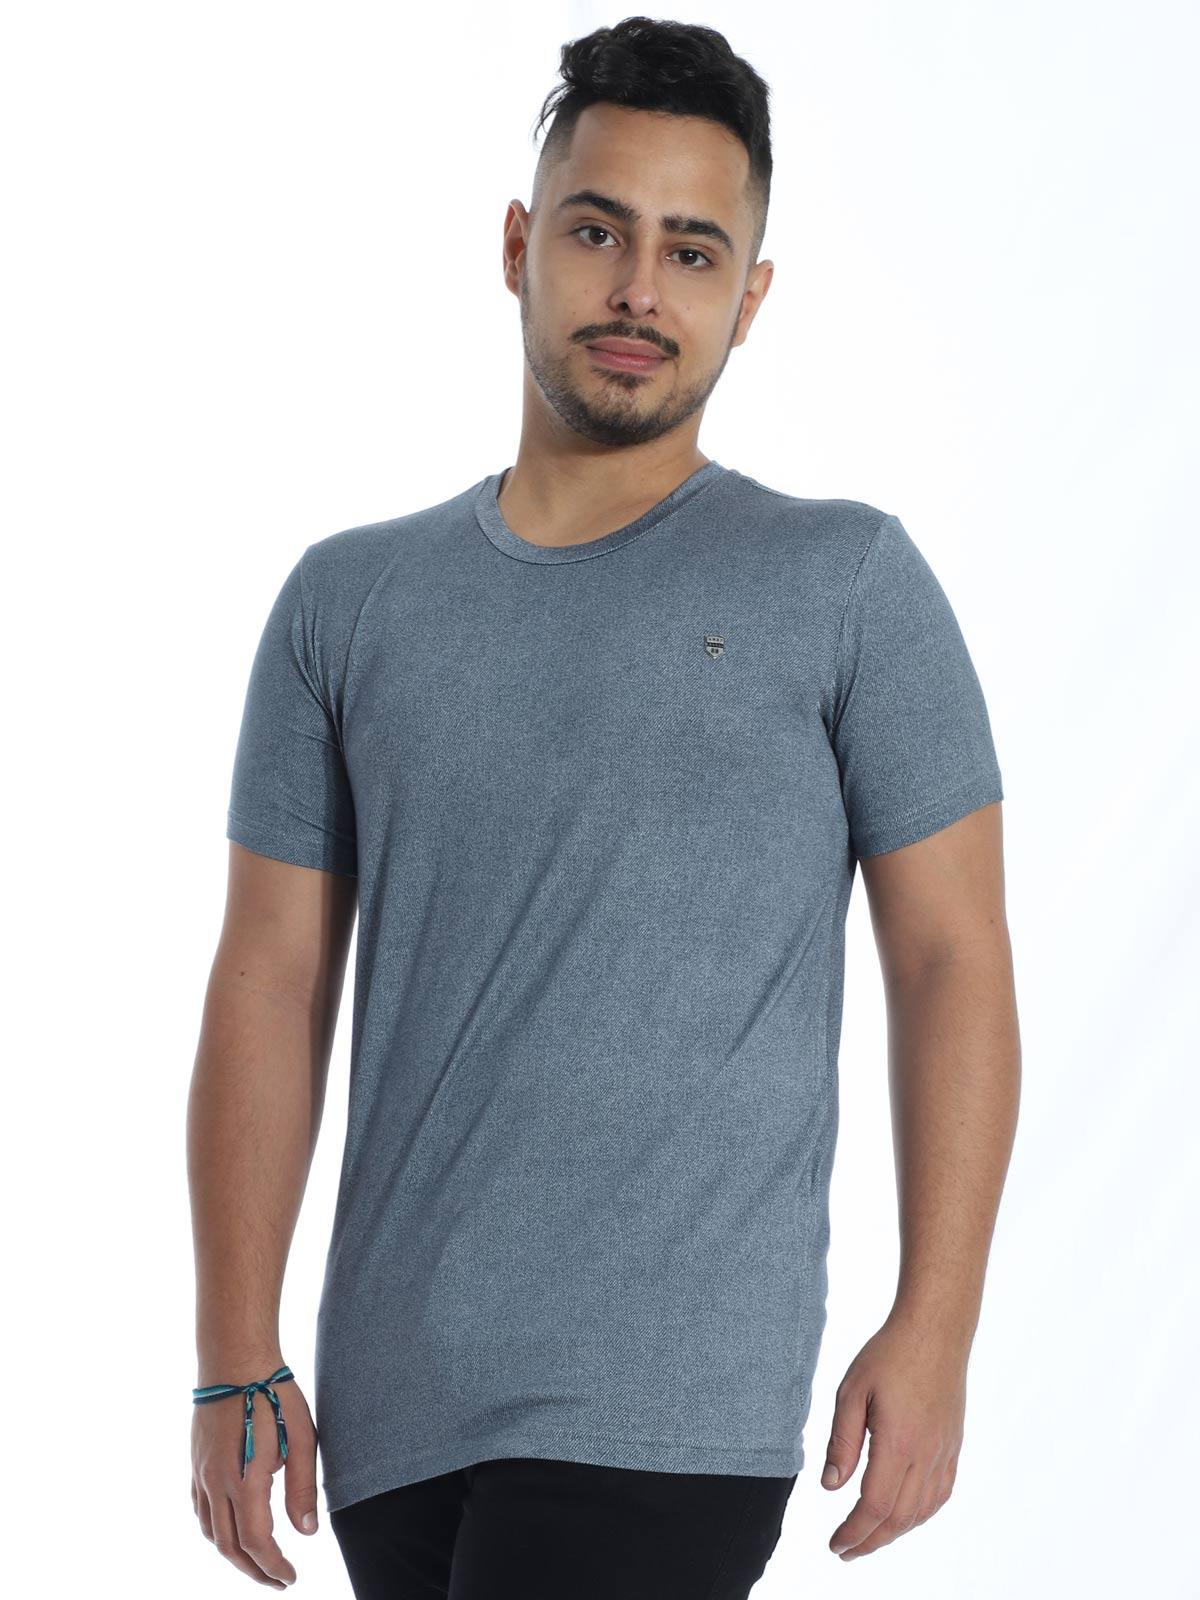 Camiseta Masculina Visco Slim Fit Anistia Jeans